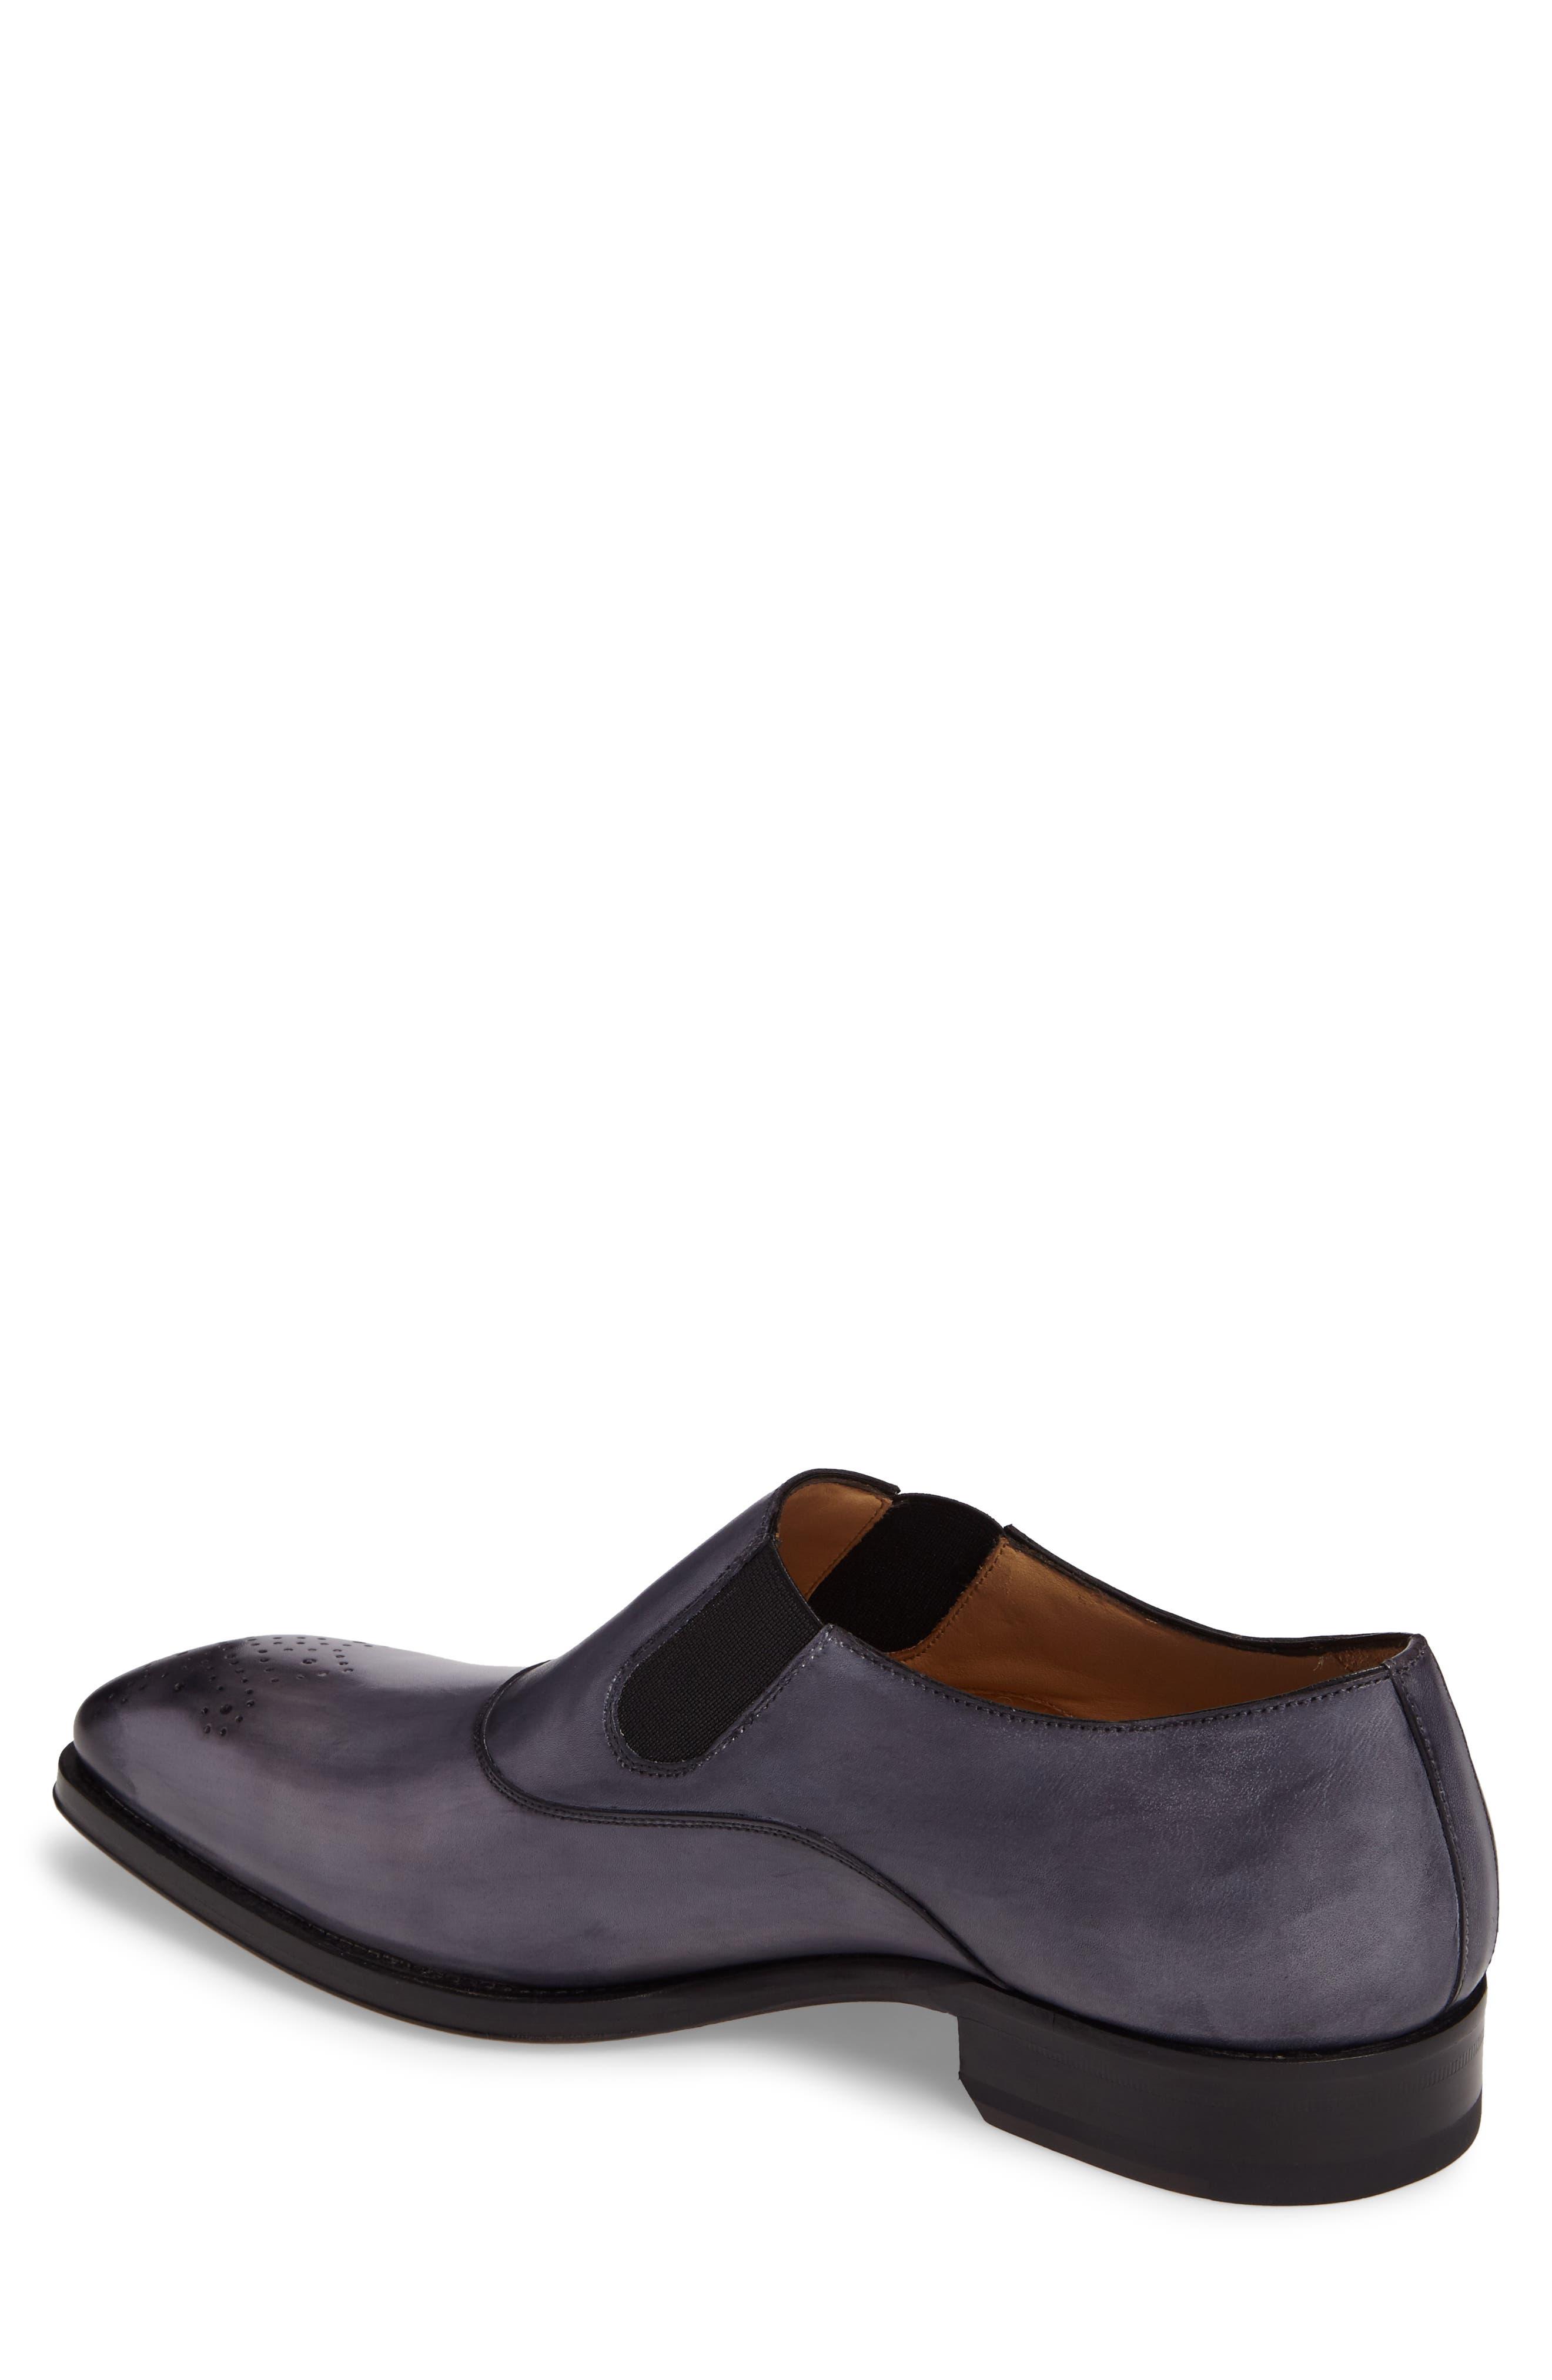 Posadas Venetian Loafer,                             Alternate thumbnail 2, color,                             020